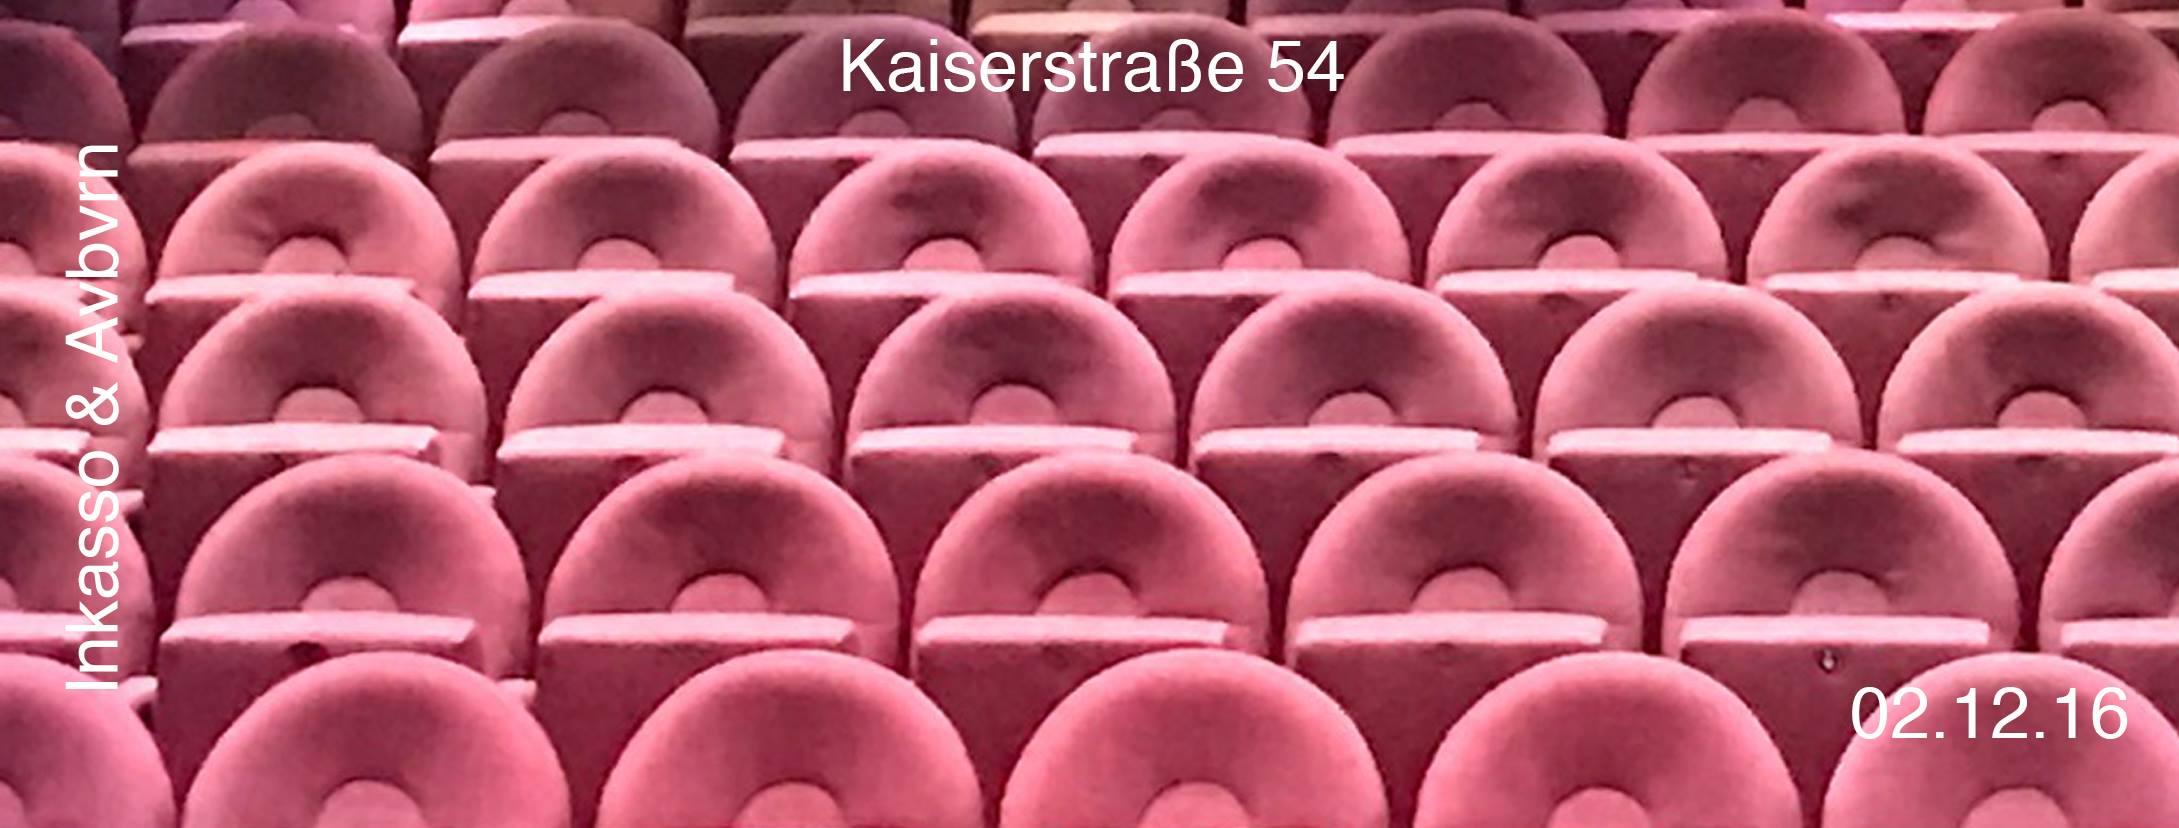 frankfurt-events-kaiserstrasse-54